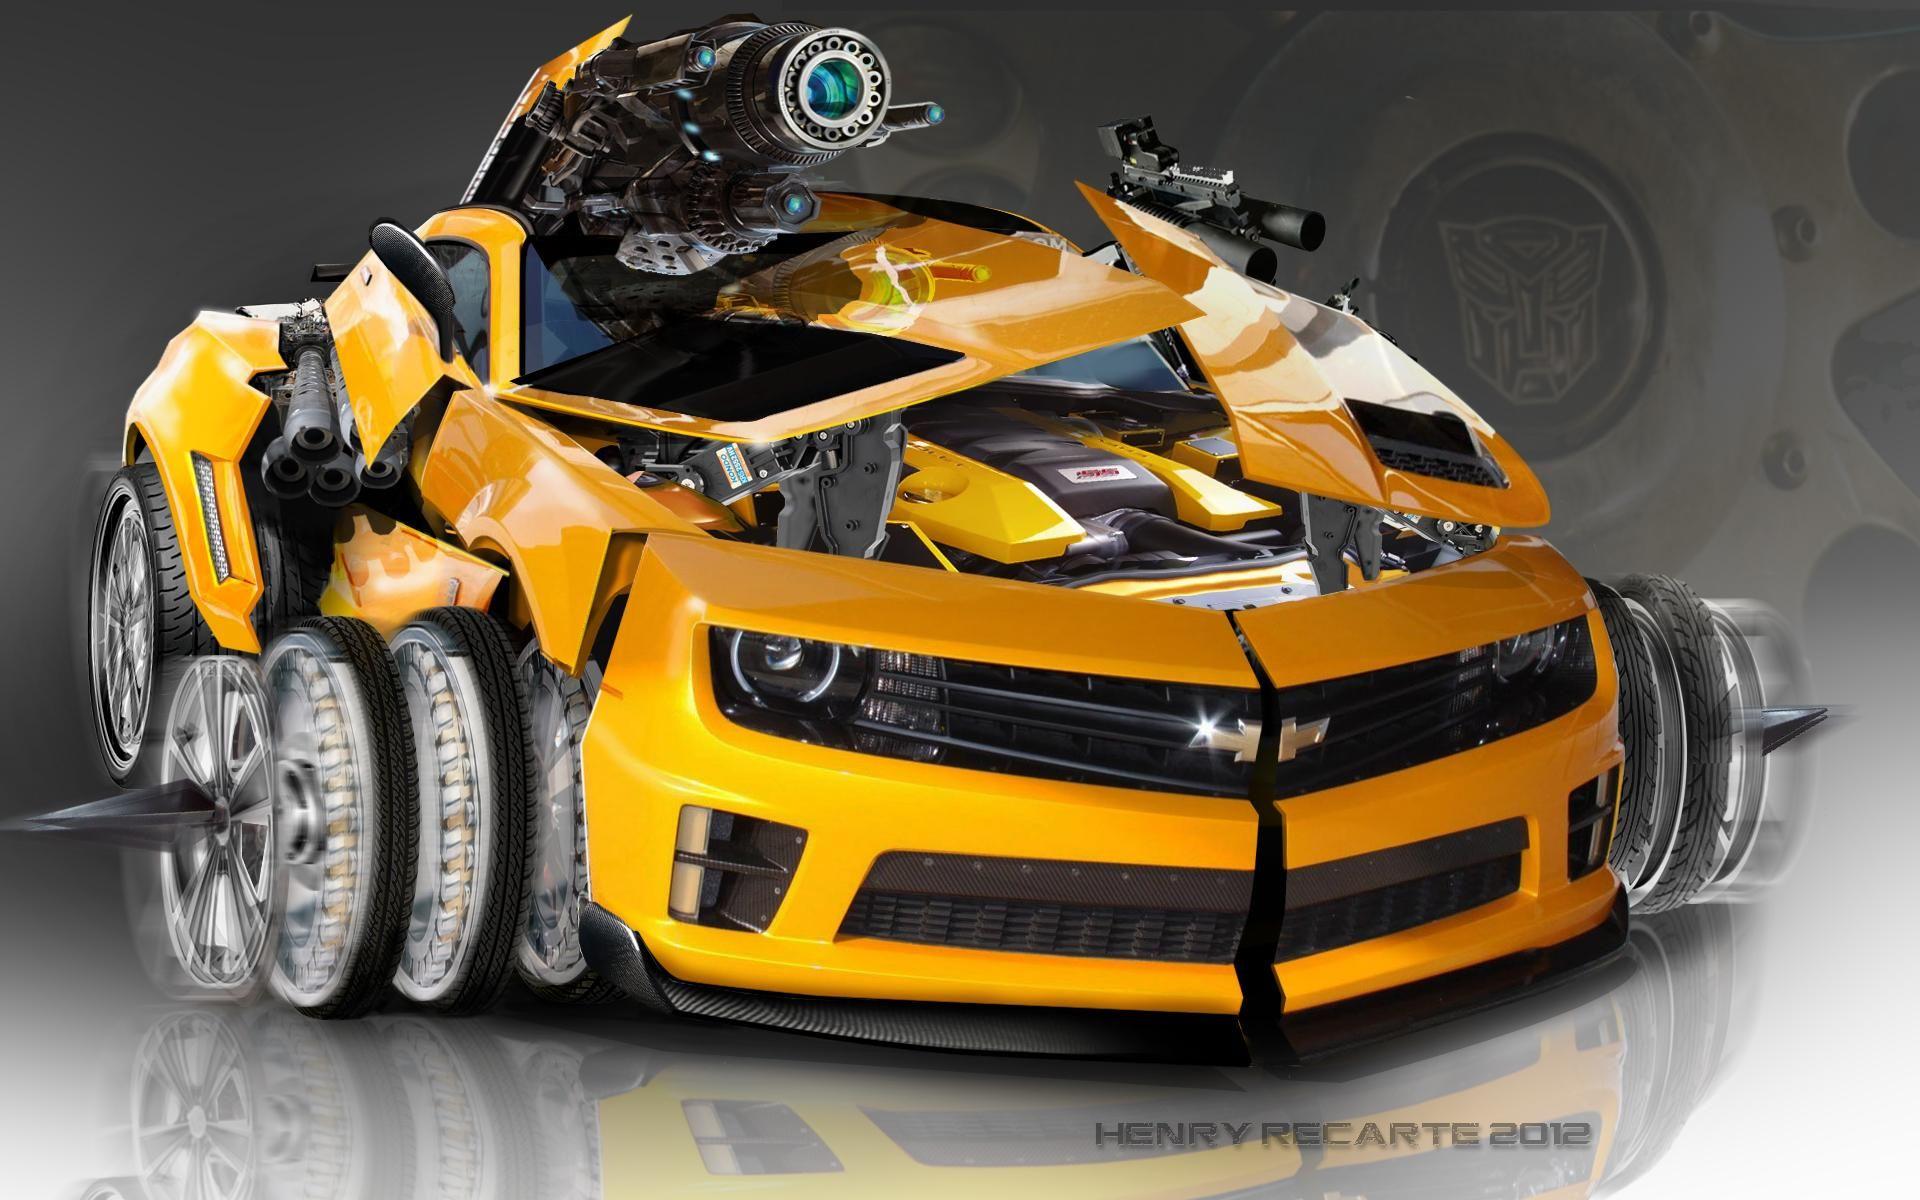 2015 Chevrolet Impala Wallpaper Widescreen | Best Quality HD ...